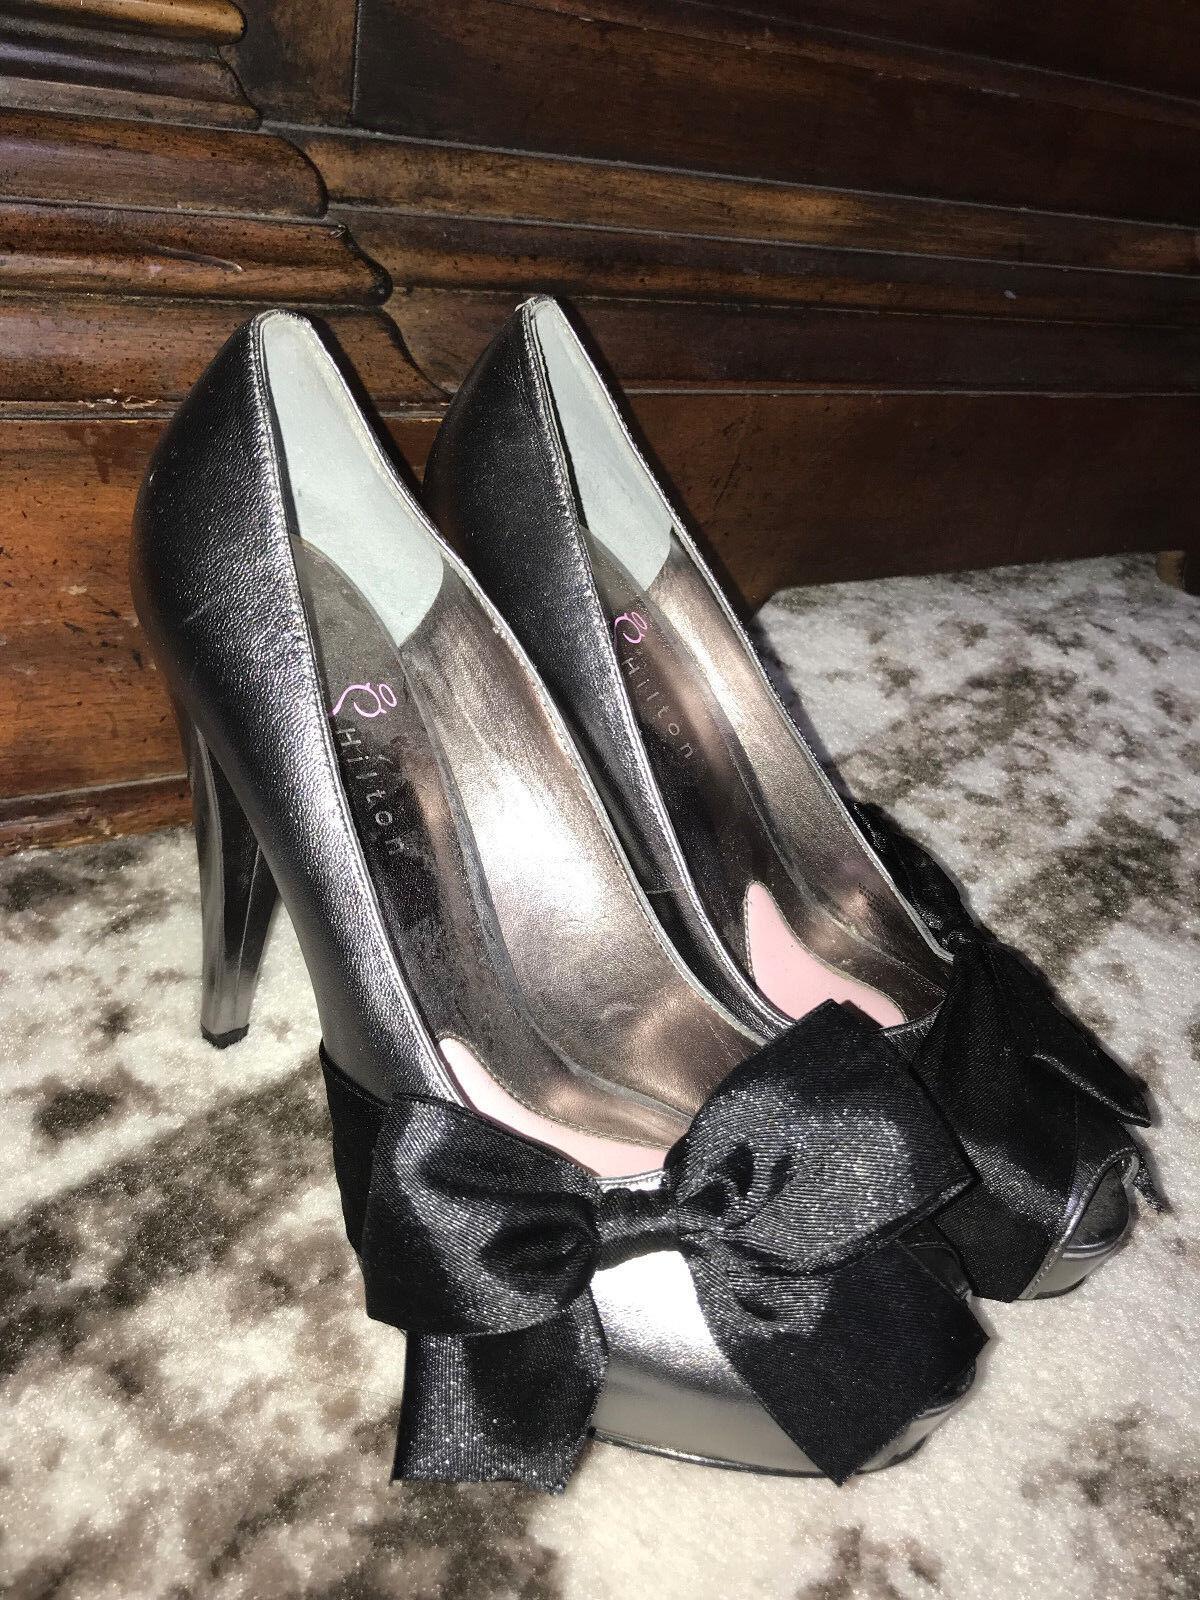 NEU PARIS HILTON silver pink bow stilettos high heels pumps schuhe-8.5-RARE-150